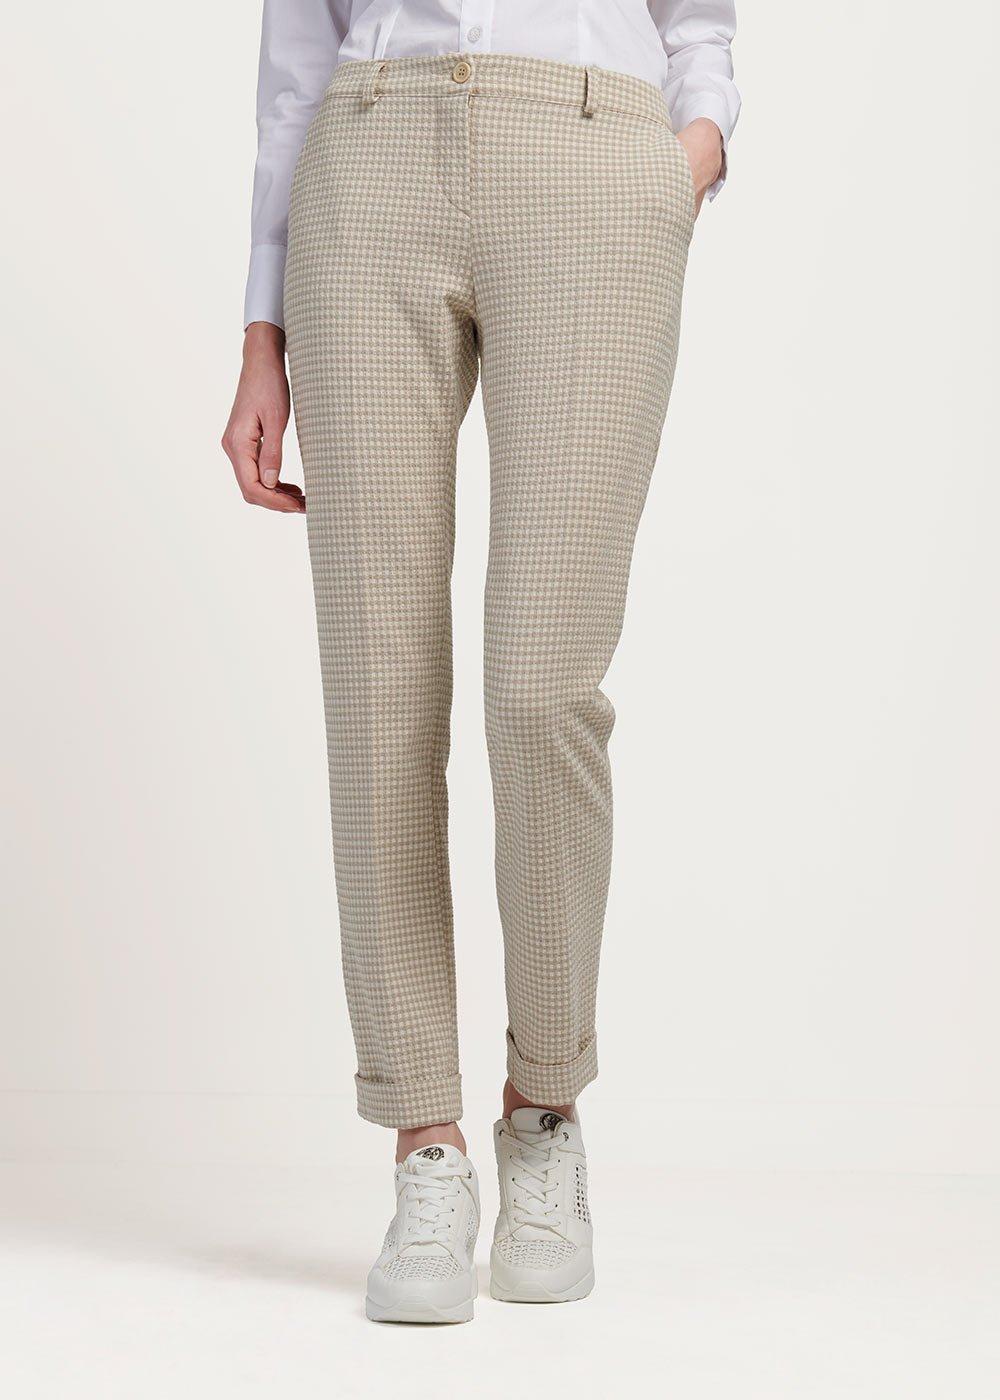 Pantalone modello Bella fantasia check - White /  Beige Fantasia - Donna